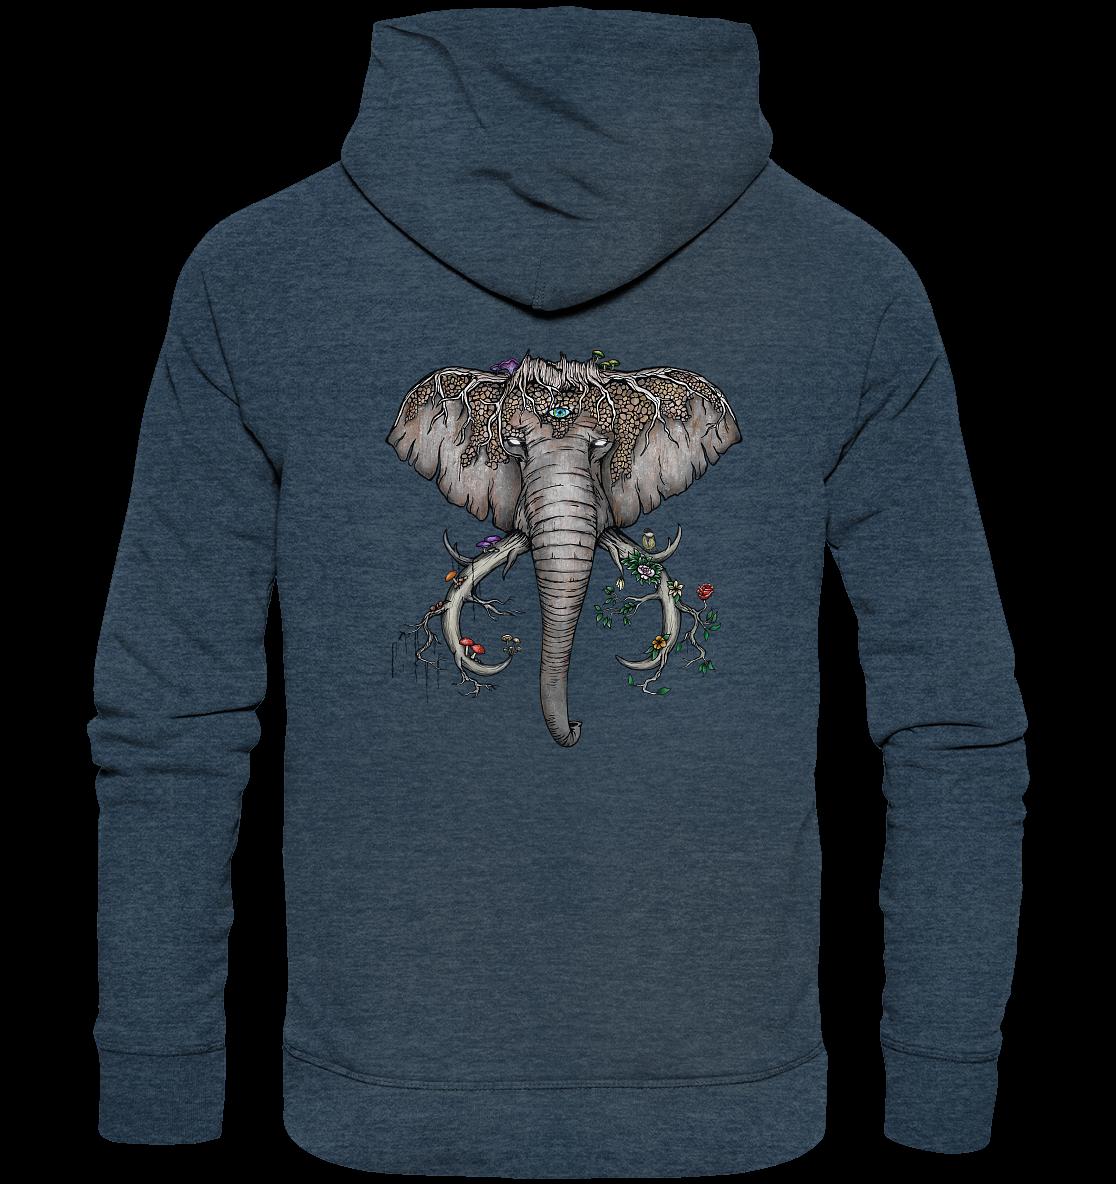 back-organic-fashion-hoodie-102940-1116x-1.png